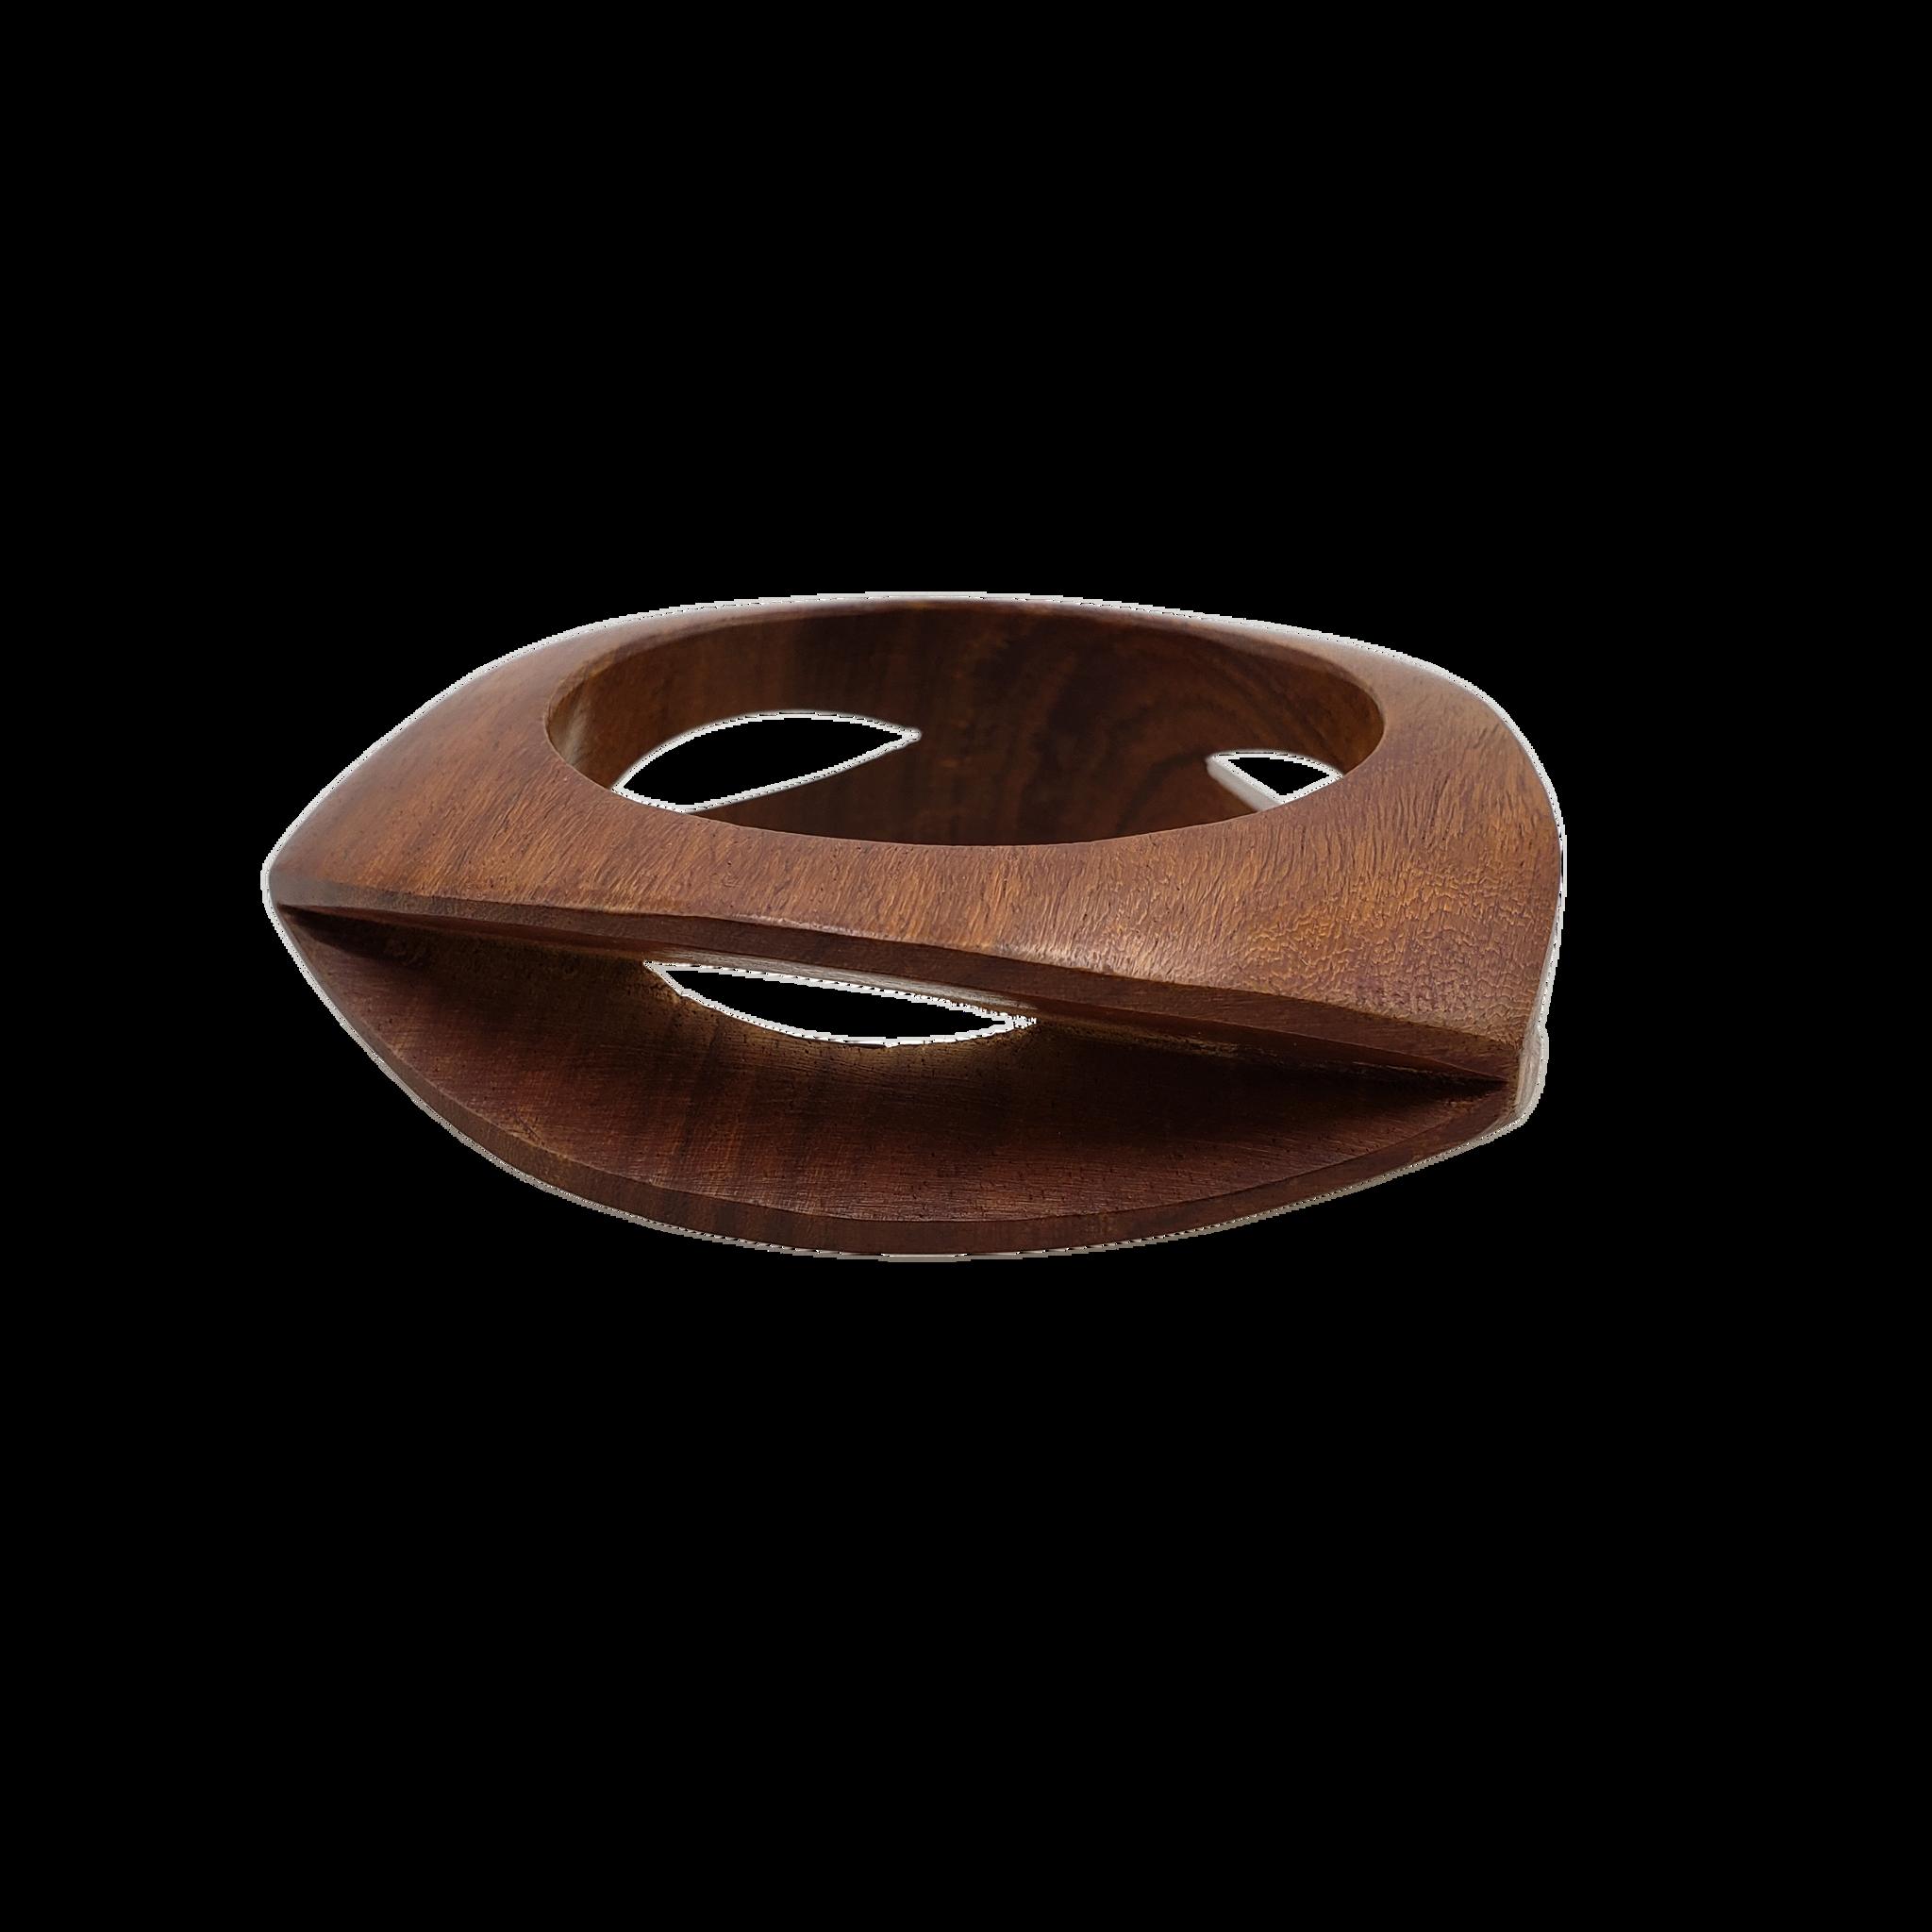 Nayu Carved Wood Bangle